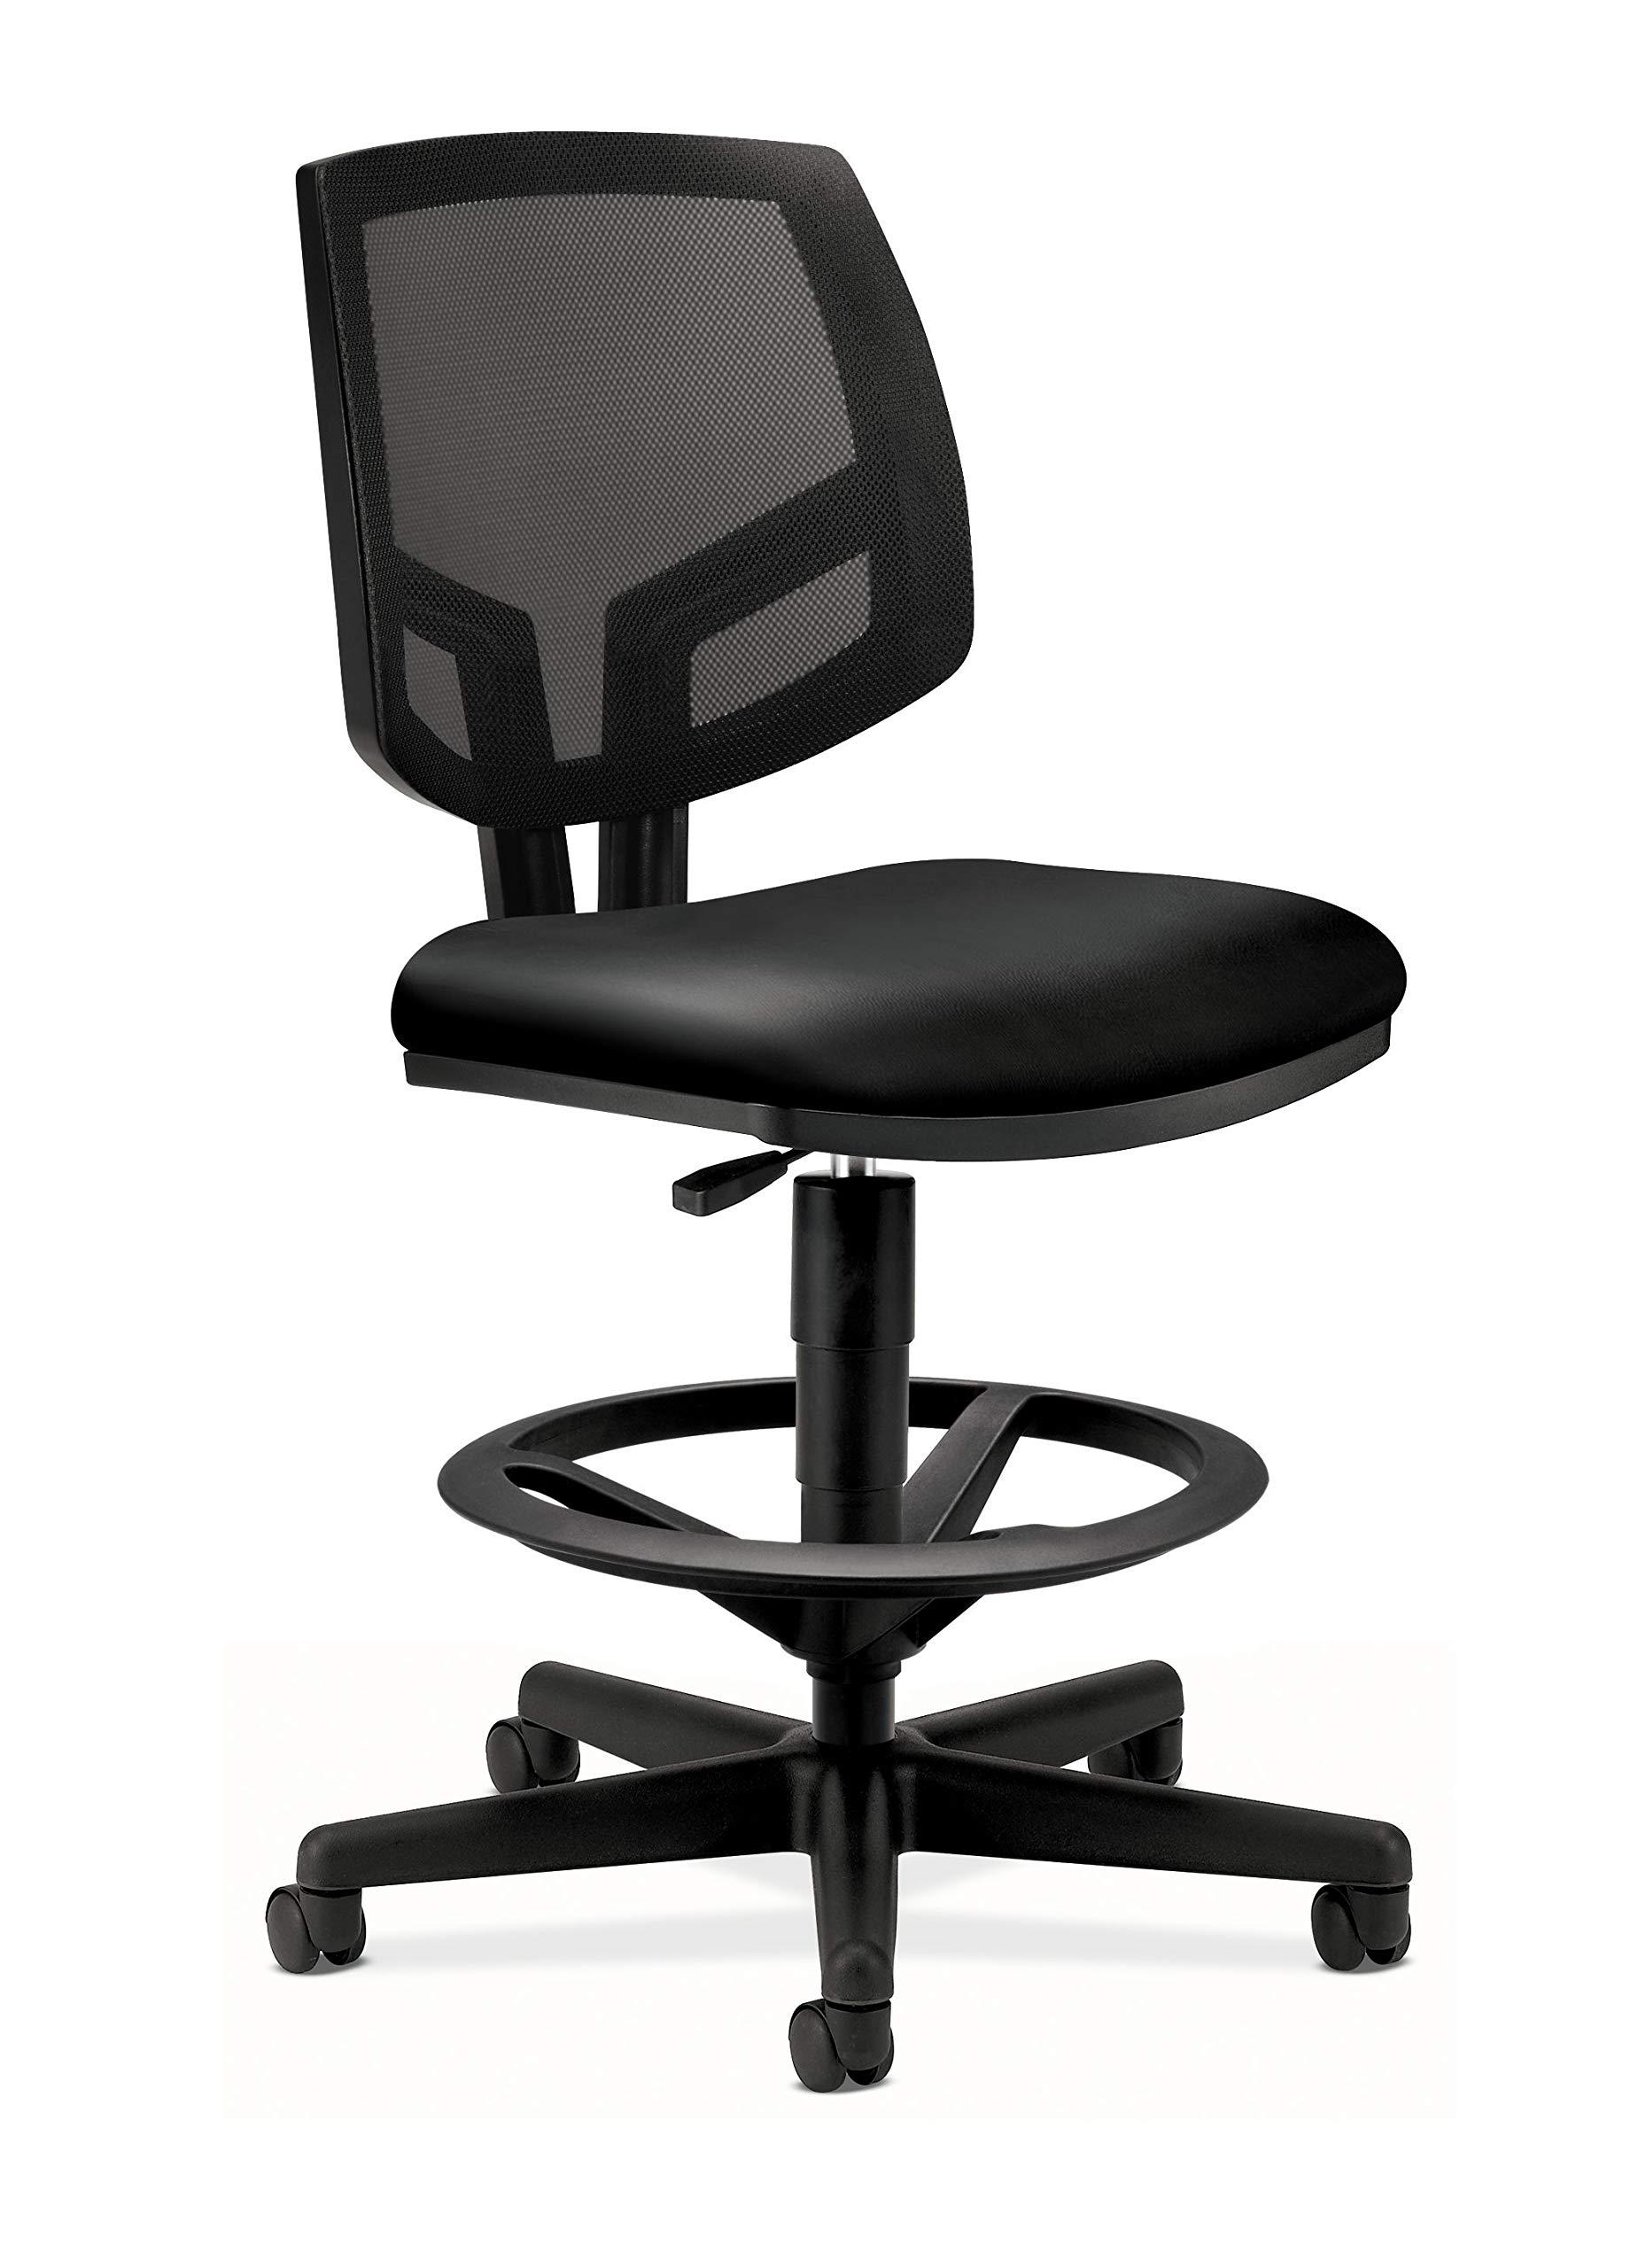 The HON Company SB11.T HON5715SB11T HON Volt Mesh Back Task Upholstered Adjustable Office Stool, Black (H5715) by HON